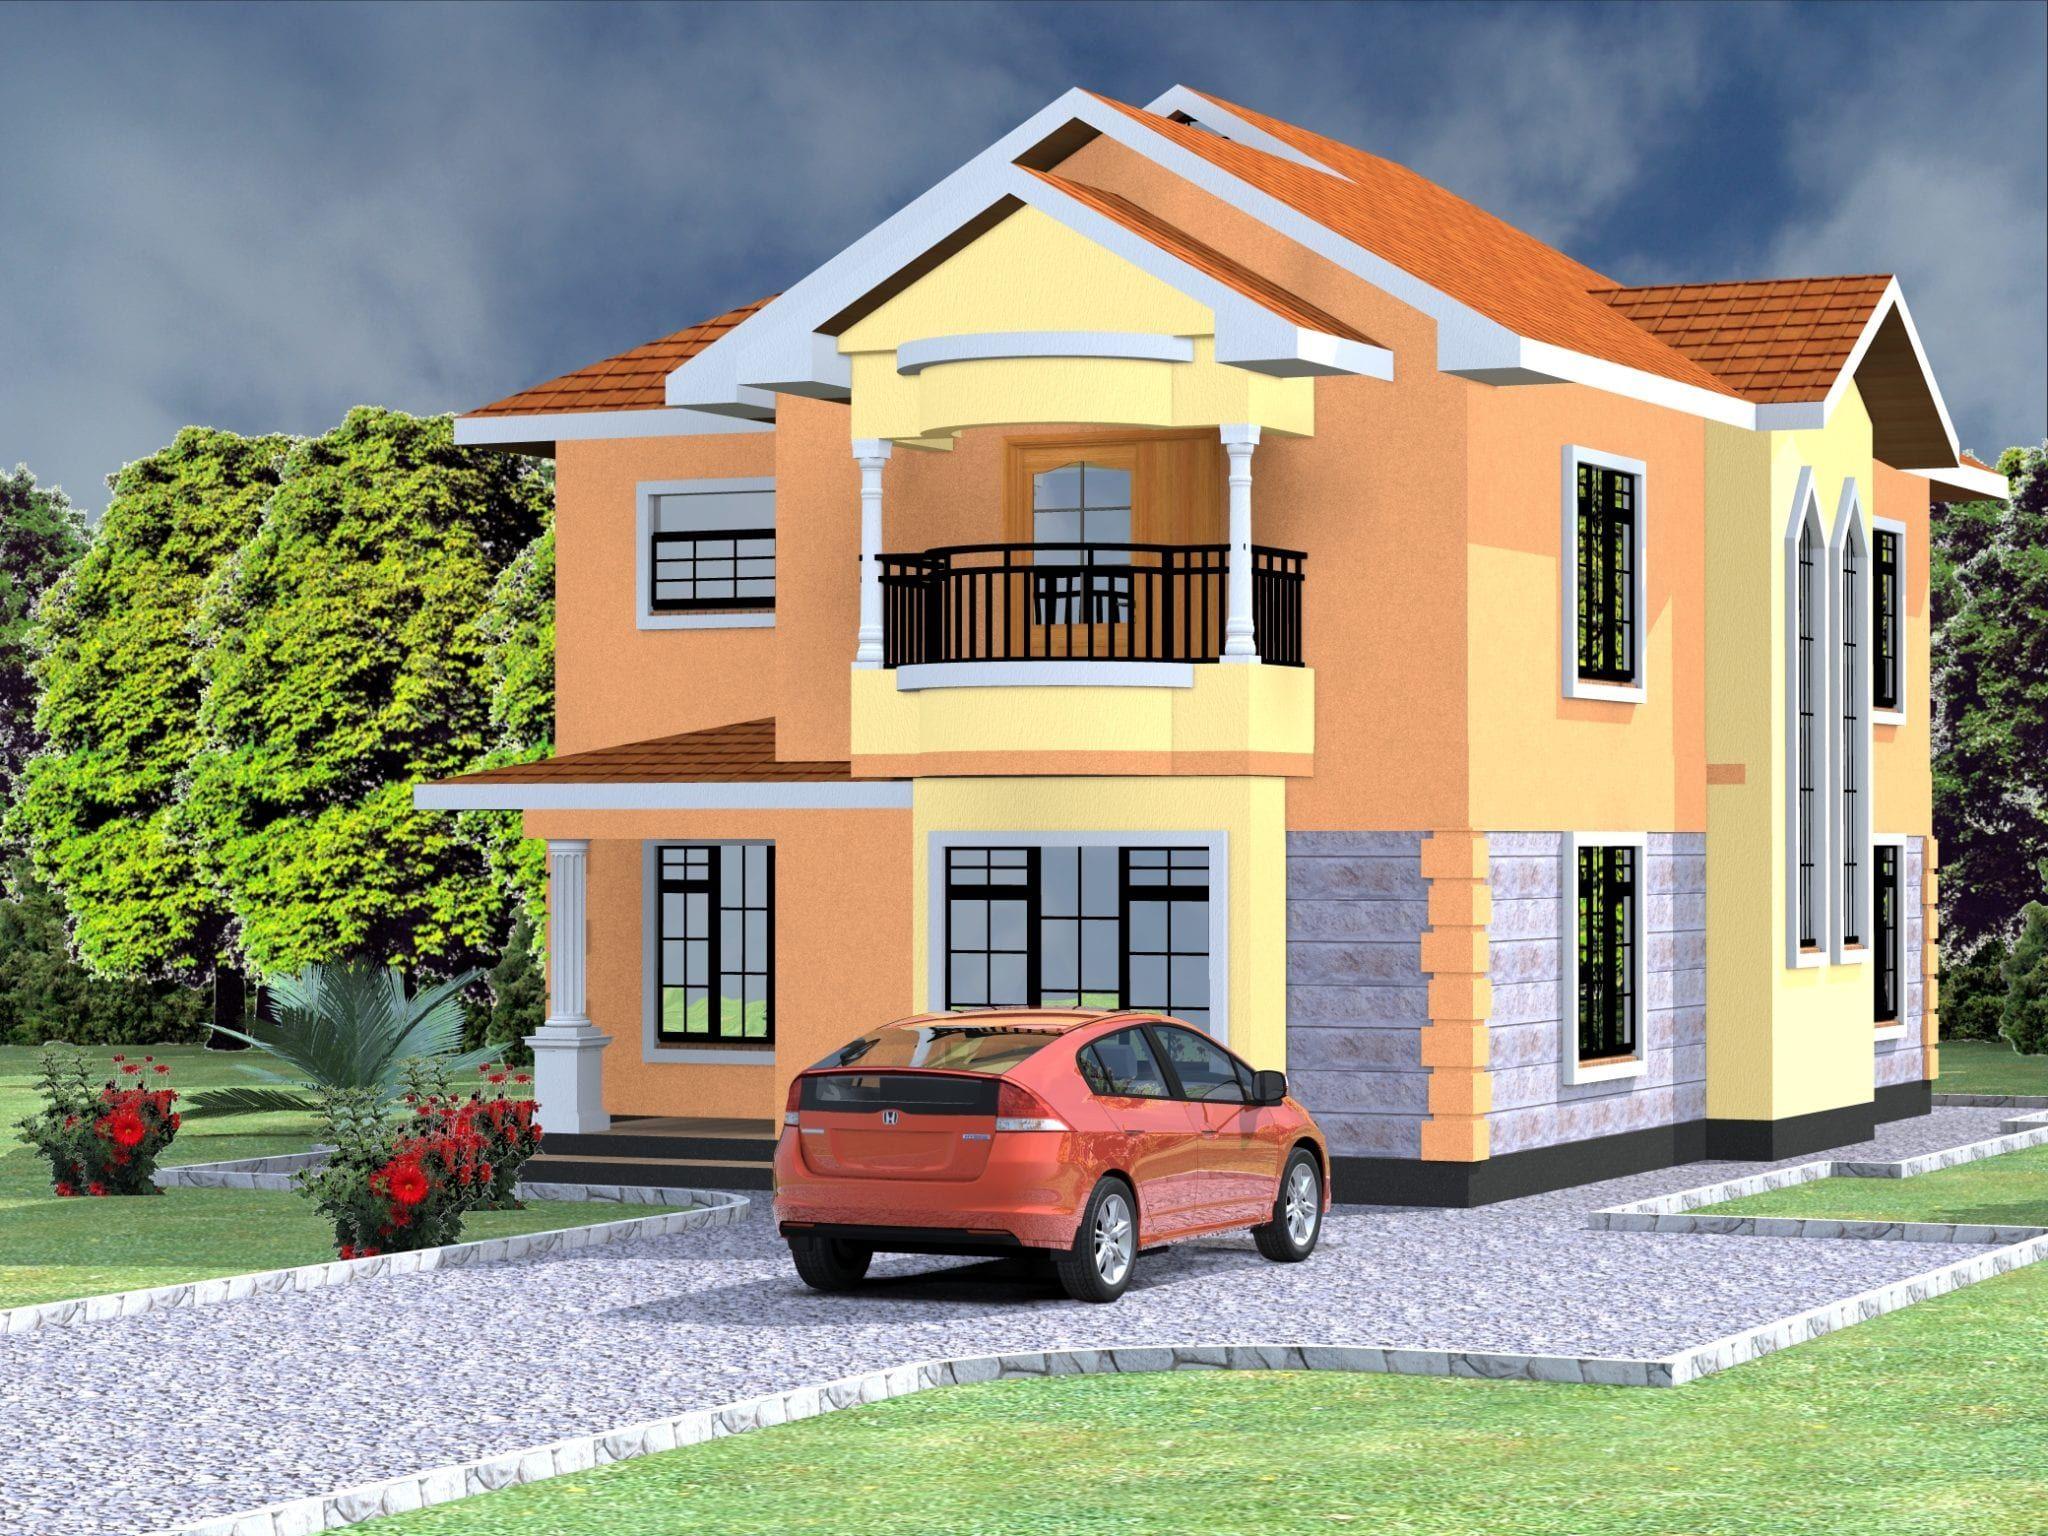 4 Bedroom Design 1032 A In 2020 Maisonette House Cost Dream House Plans